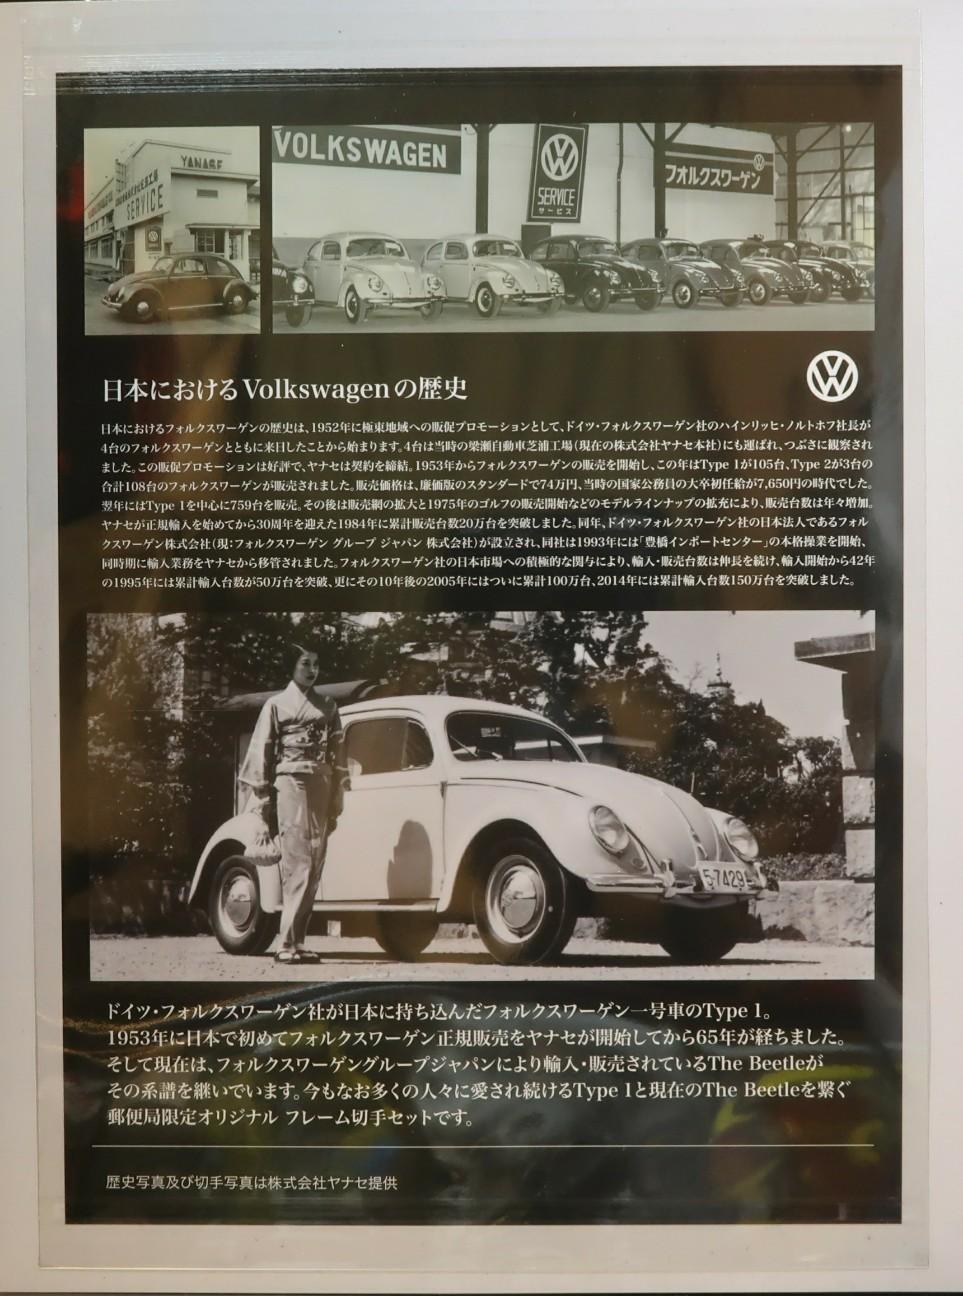 f:id:kurumazukinogen:20190117211020j:image